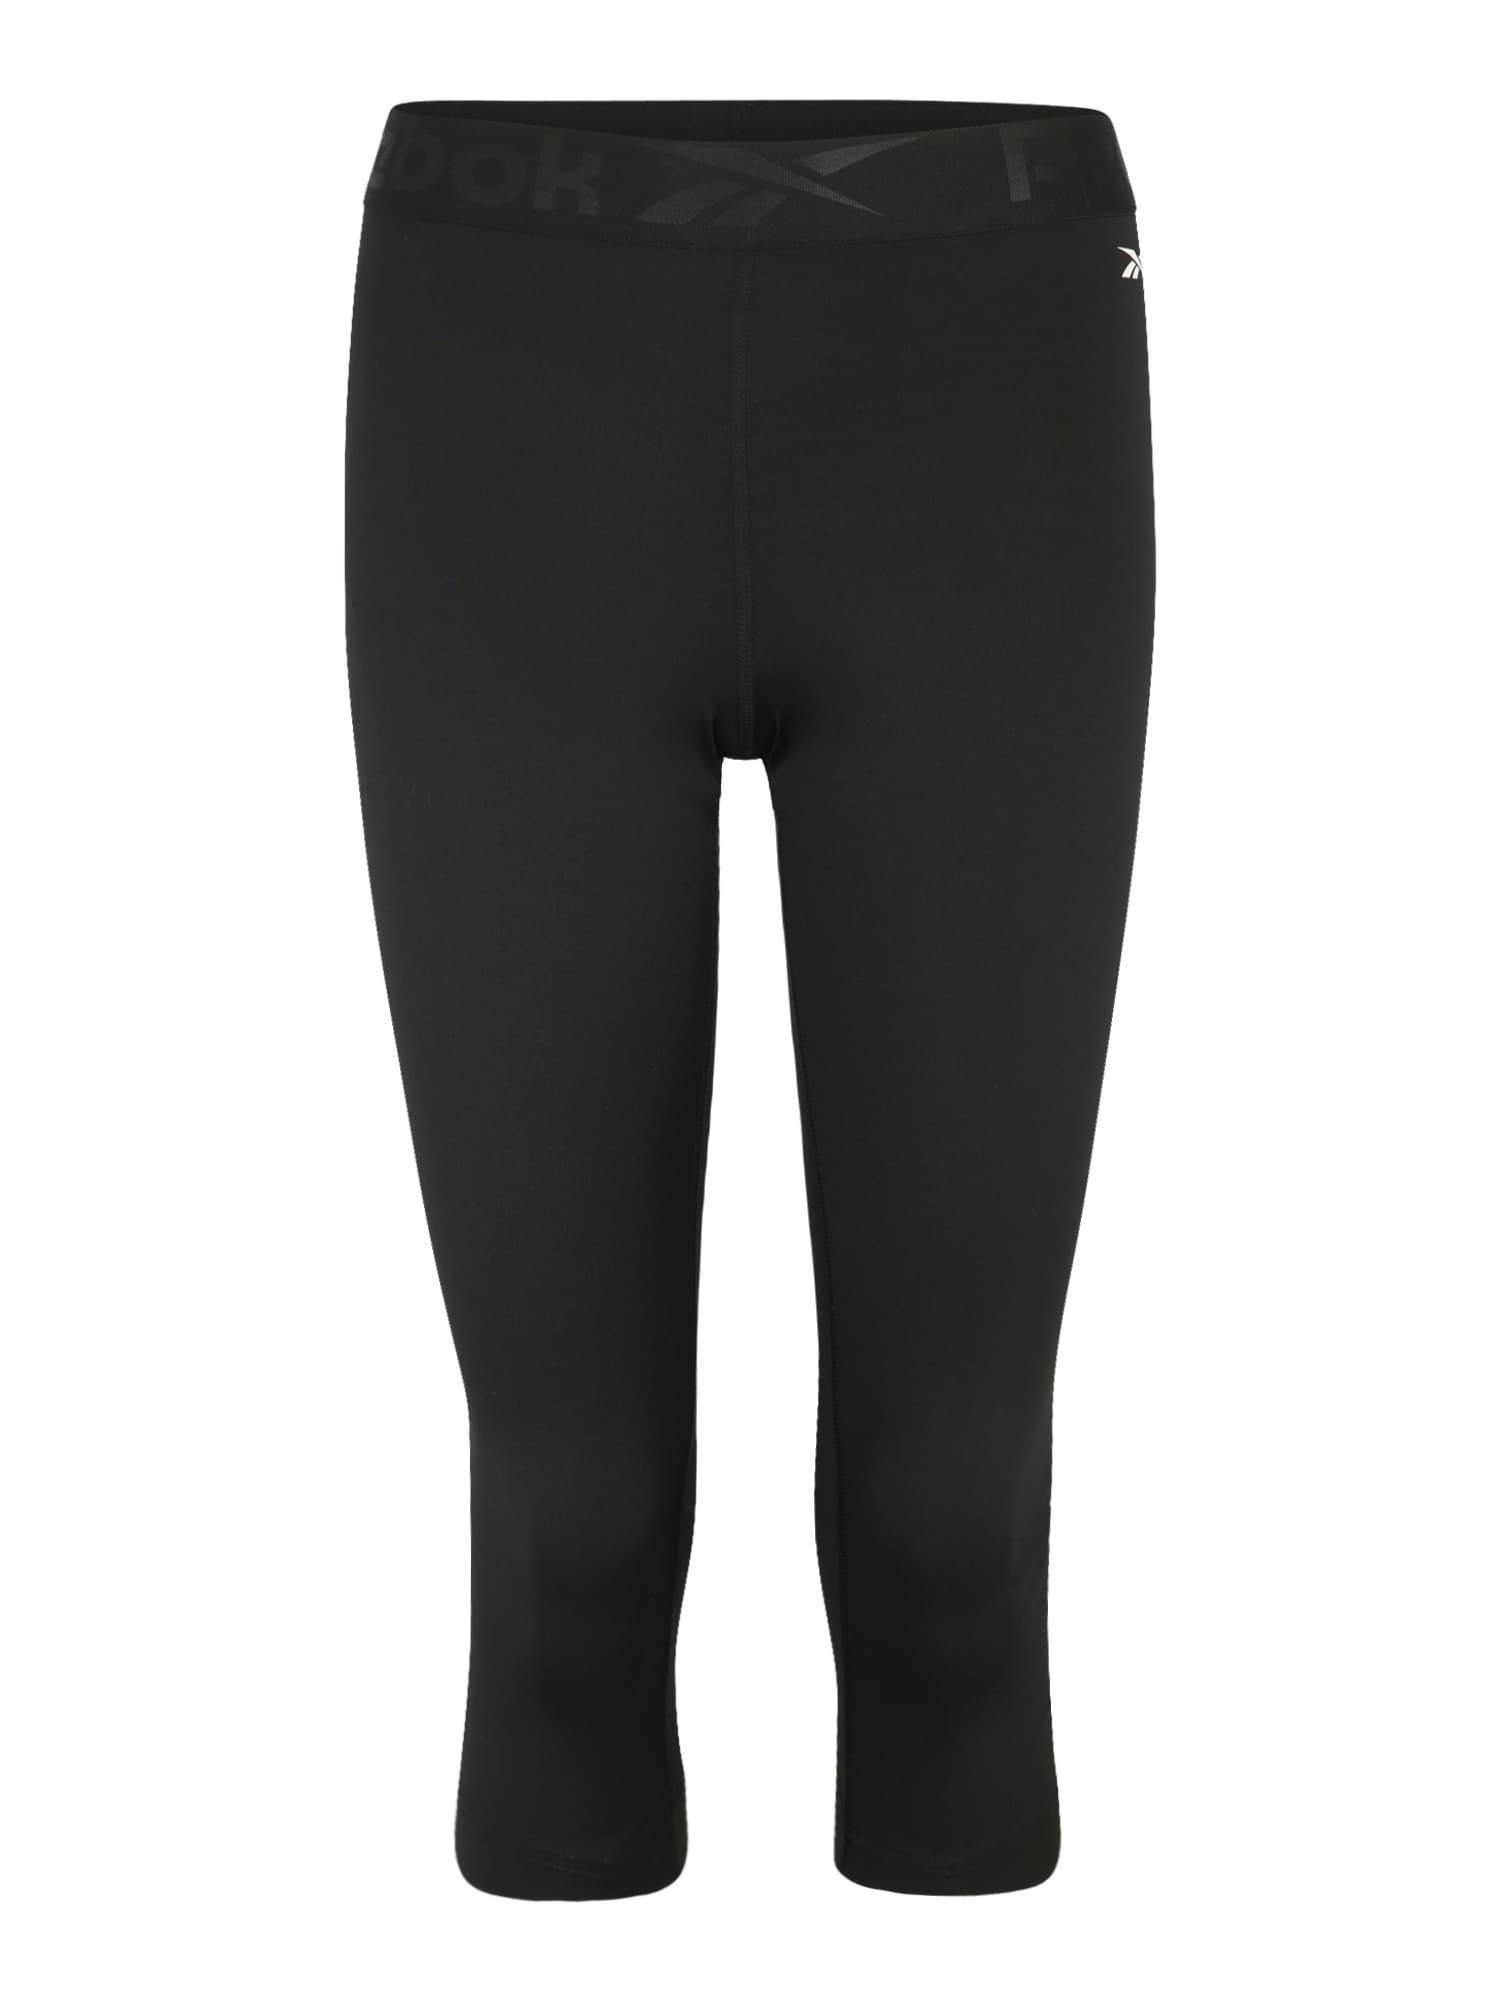 REEBOK Športové nohavice  tmavosivá / čierna